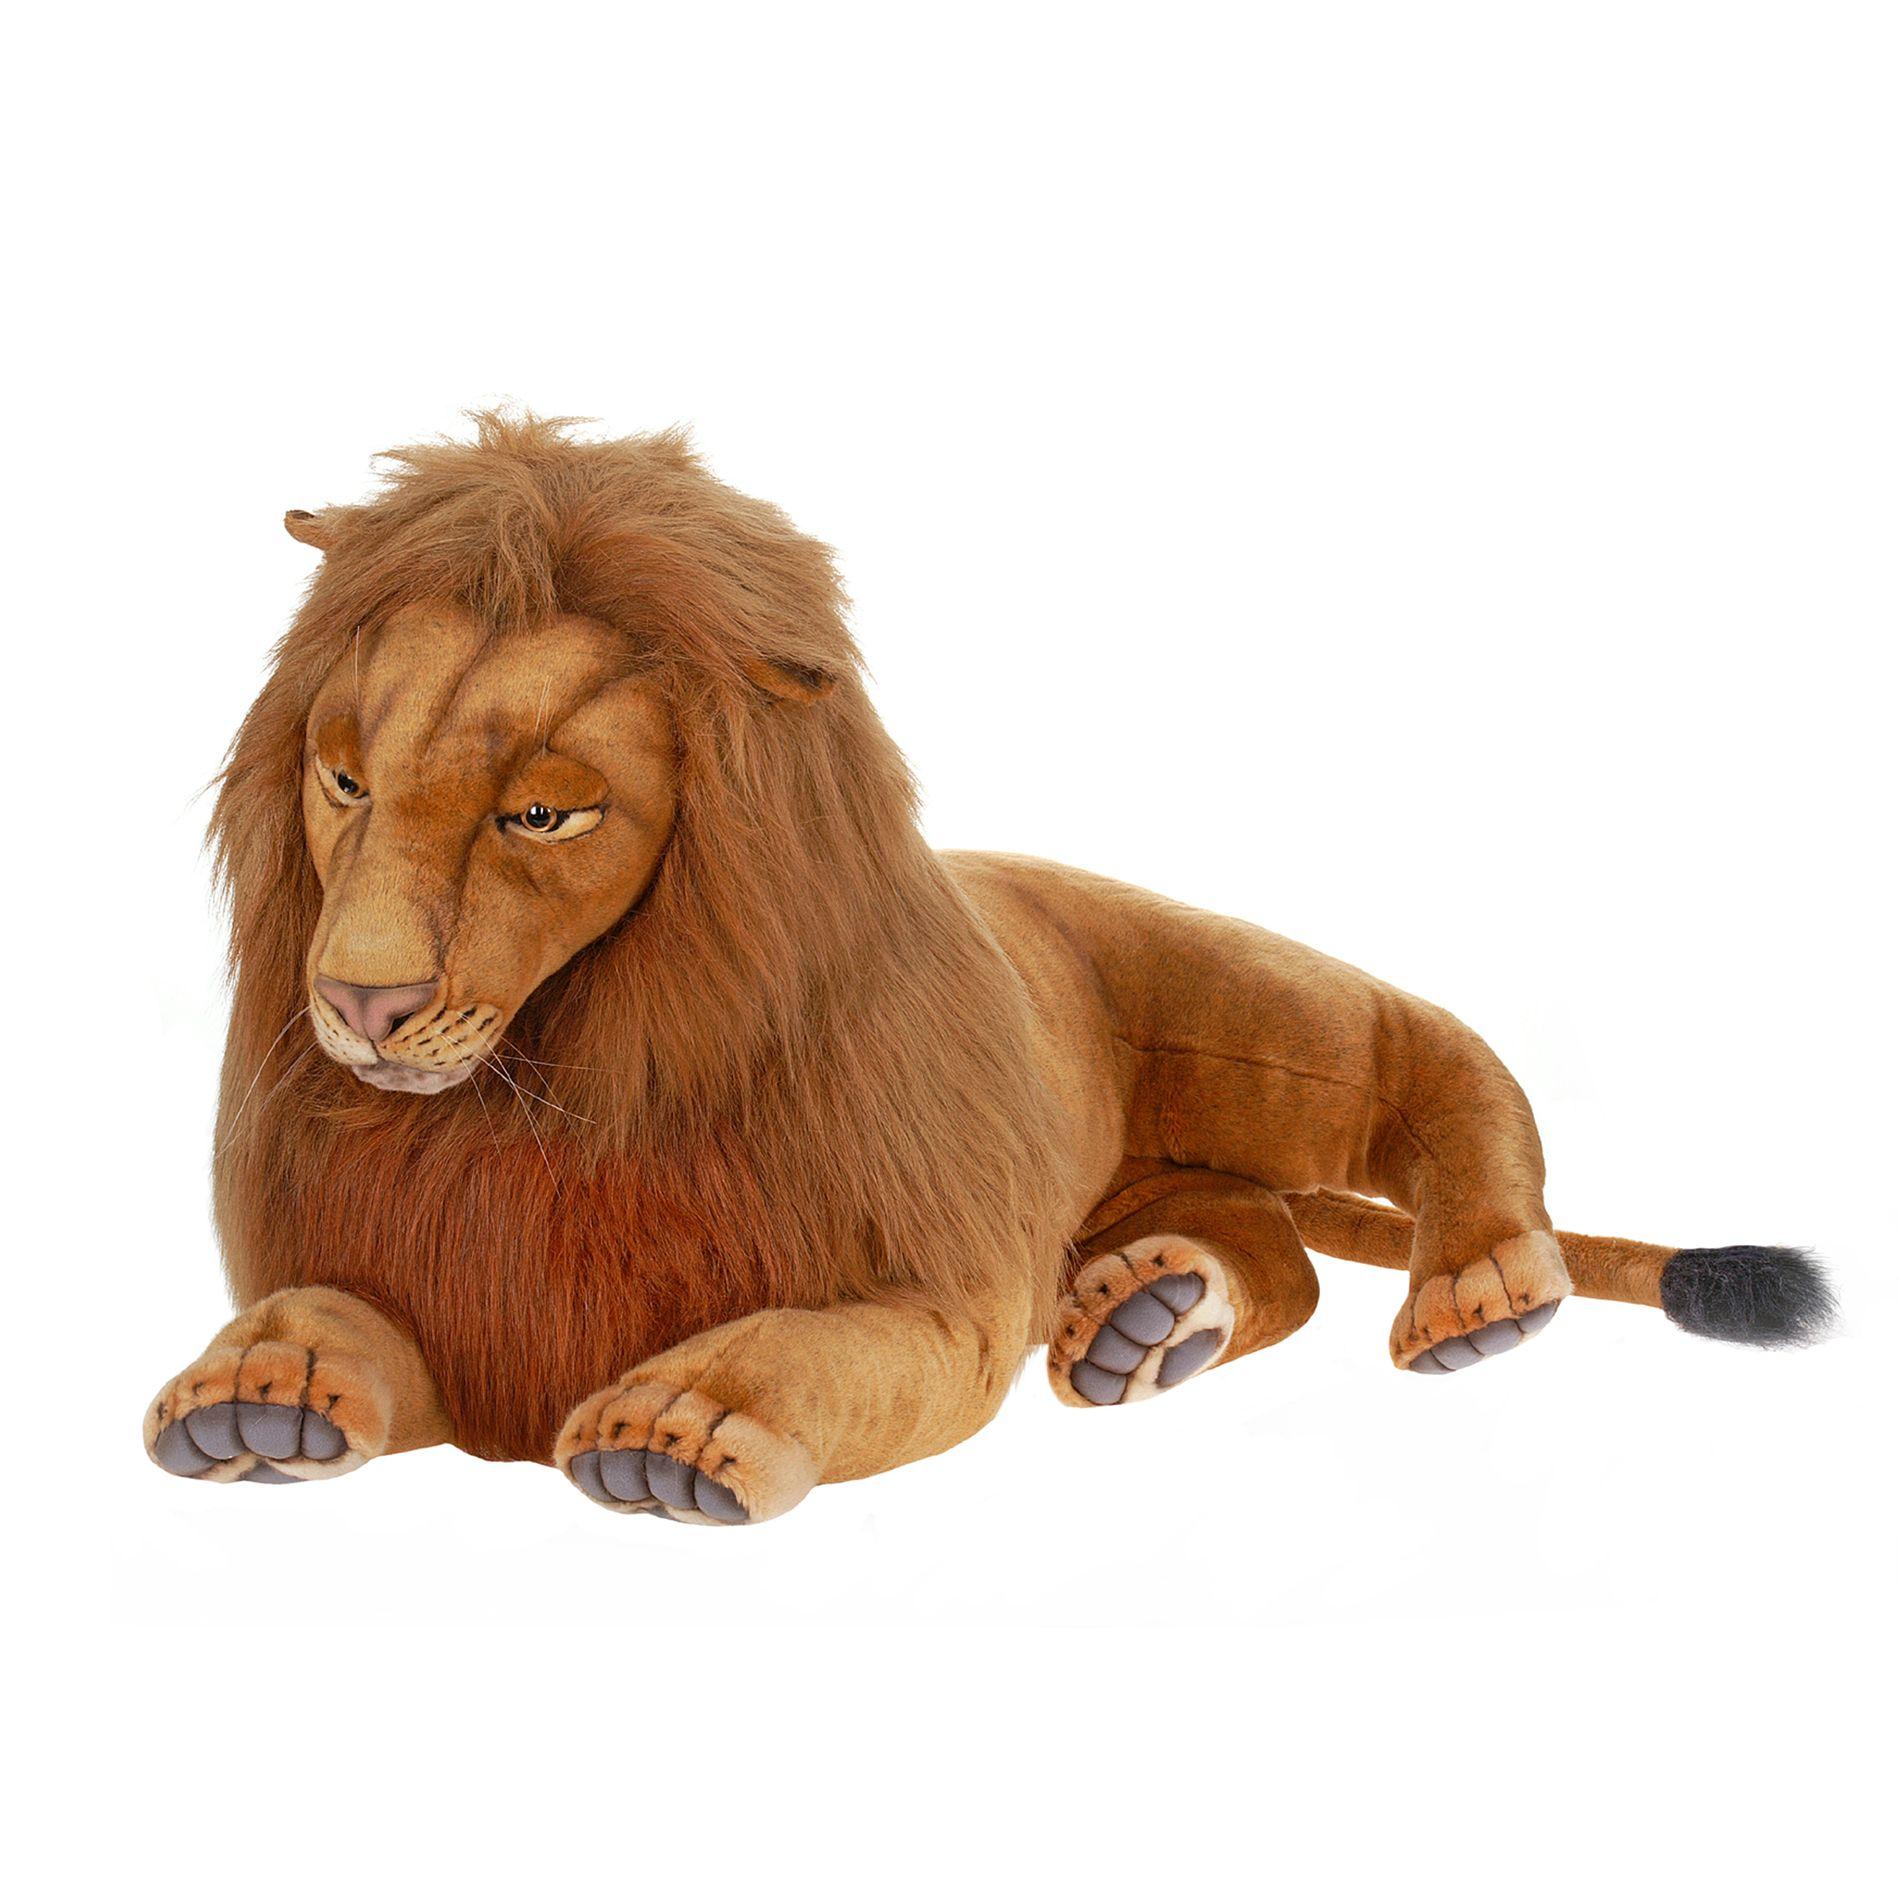 Hansa Creation 70 Inch Extra Large Laying Male Lion Stuffed Animal